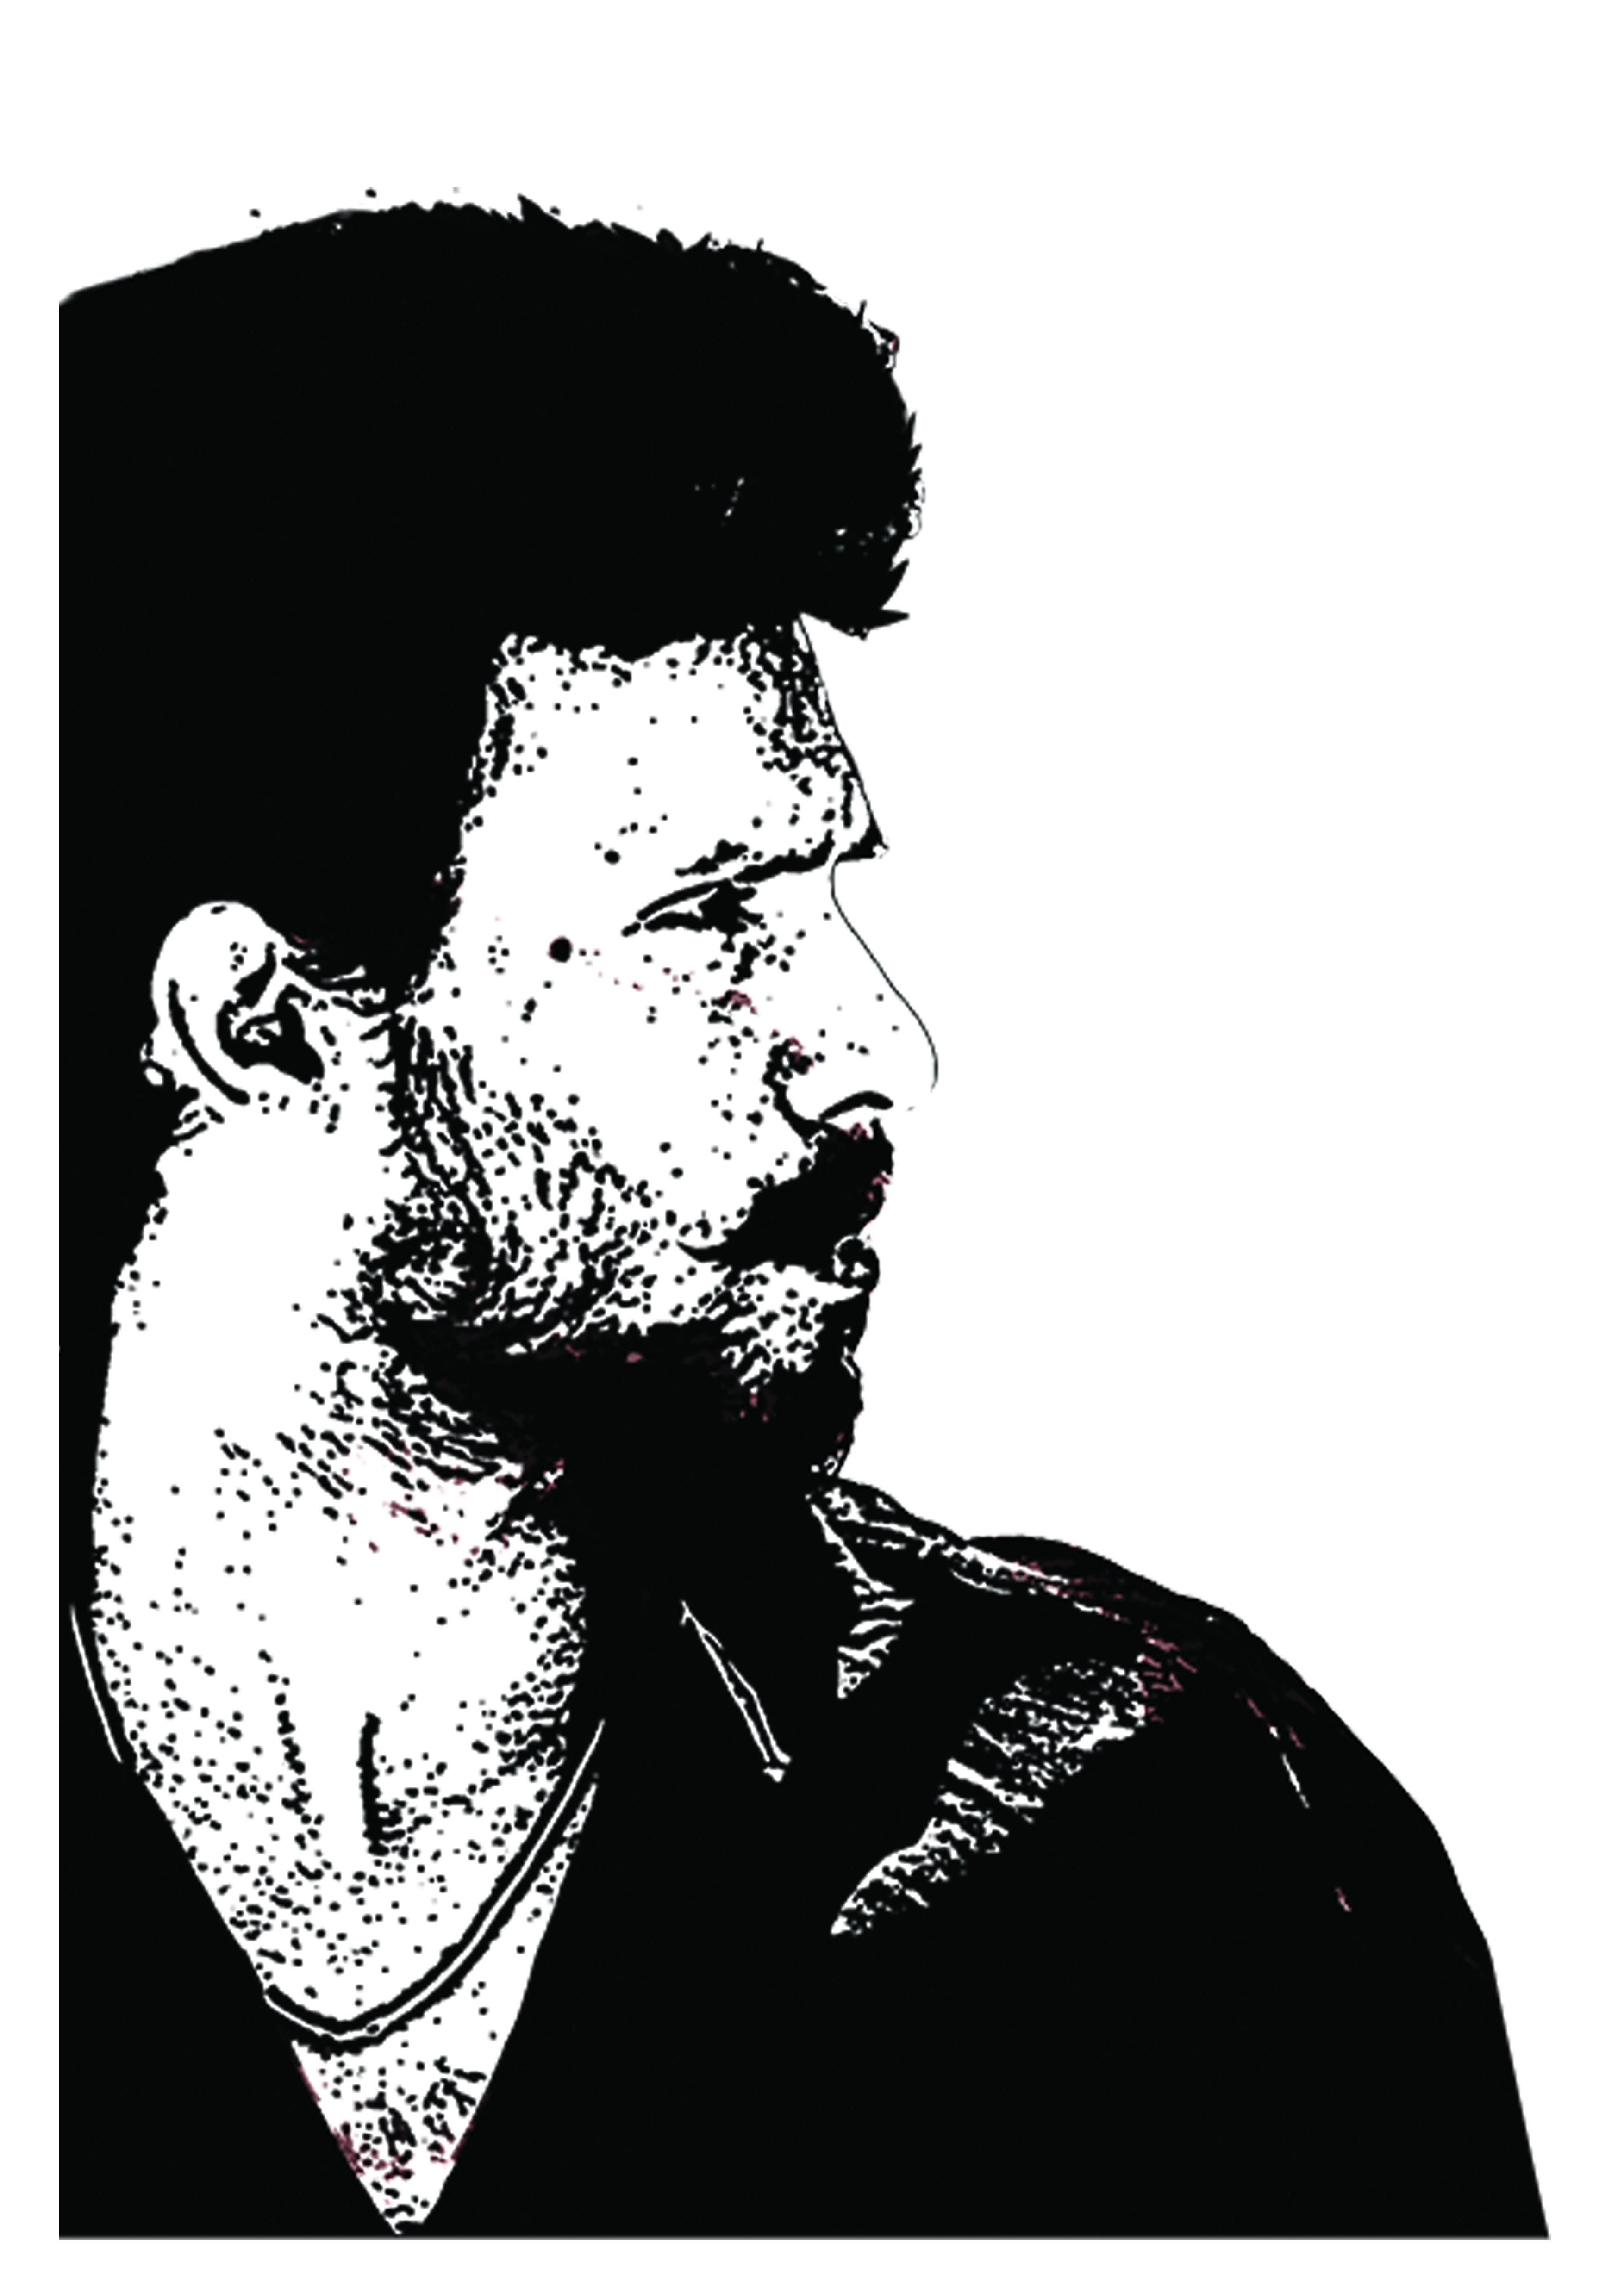 Saravanan Subramani